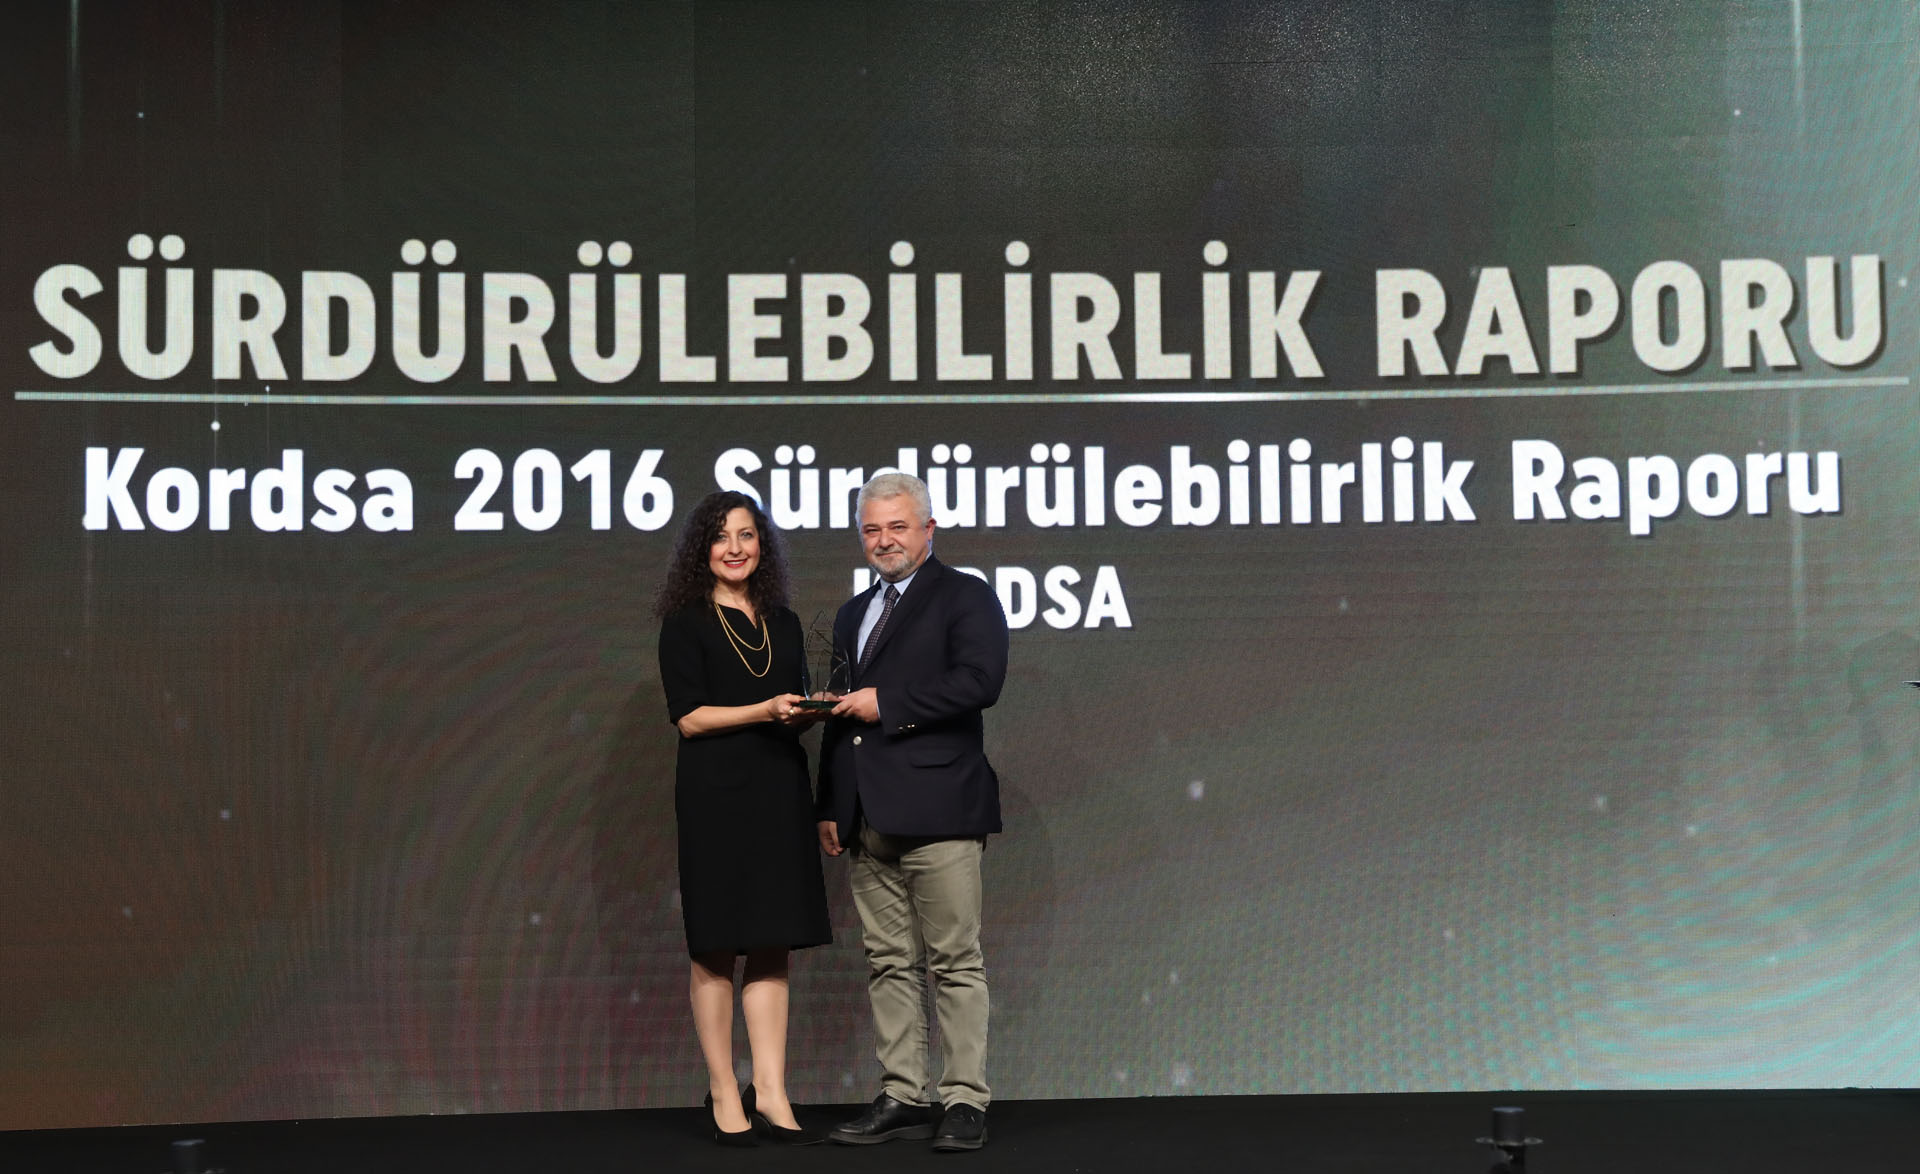 Sustainable Business Award to Kordsa Sustainability Report